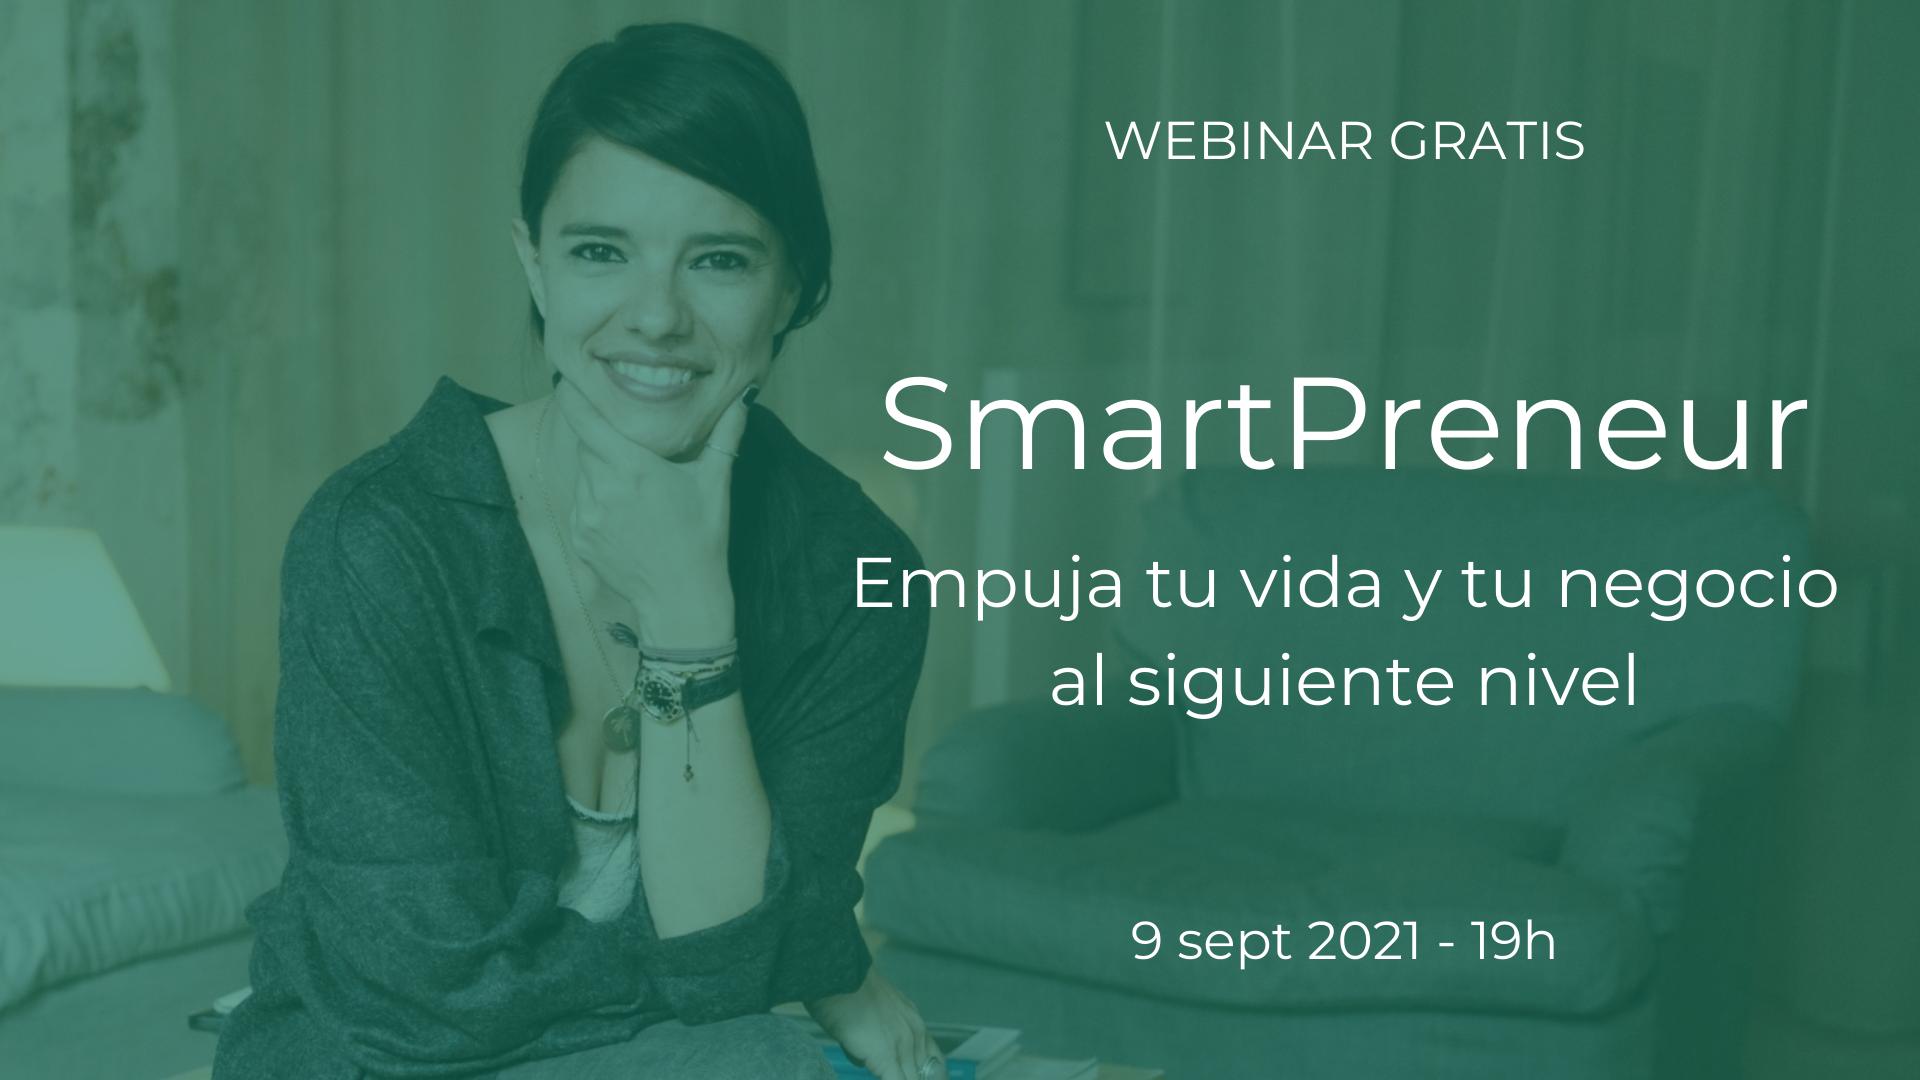 Webinar SmartPreneur